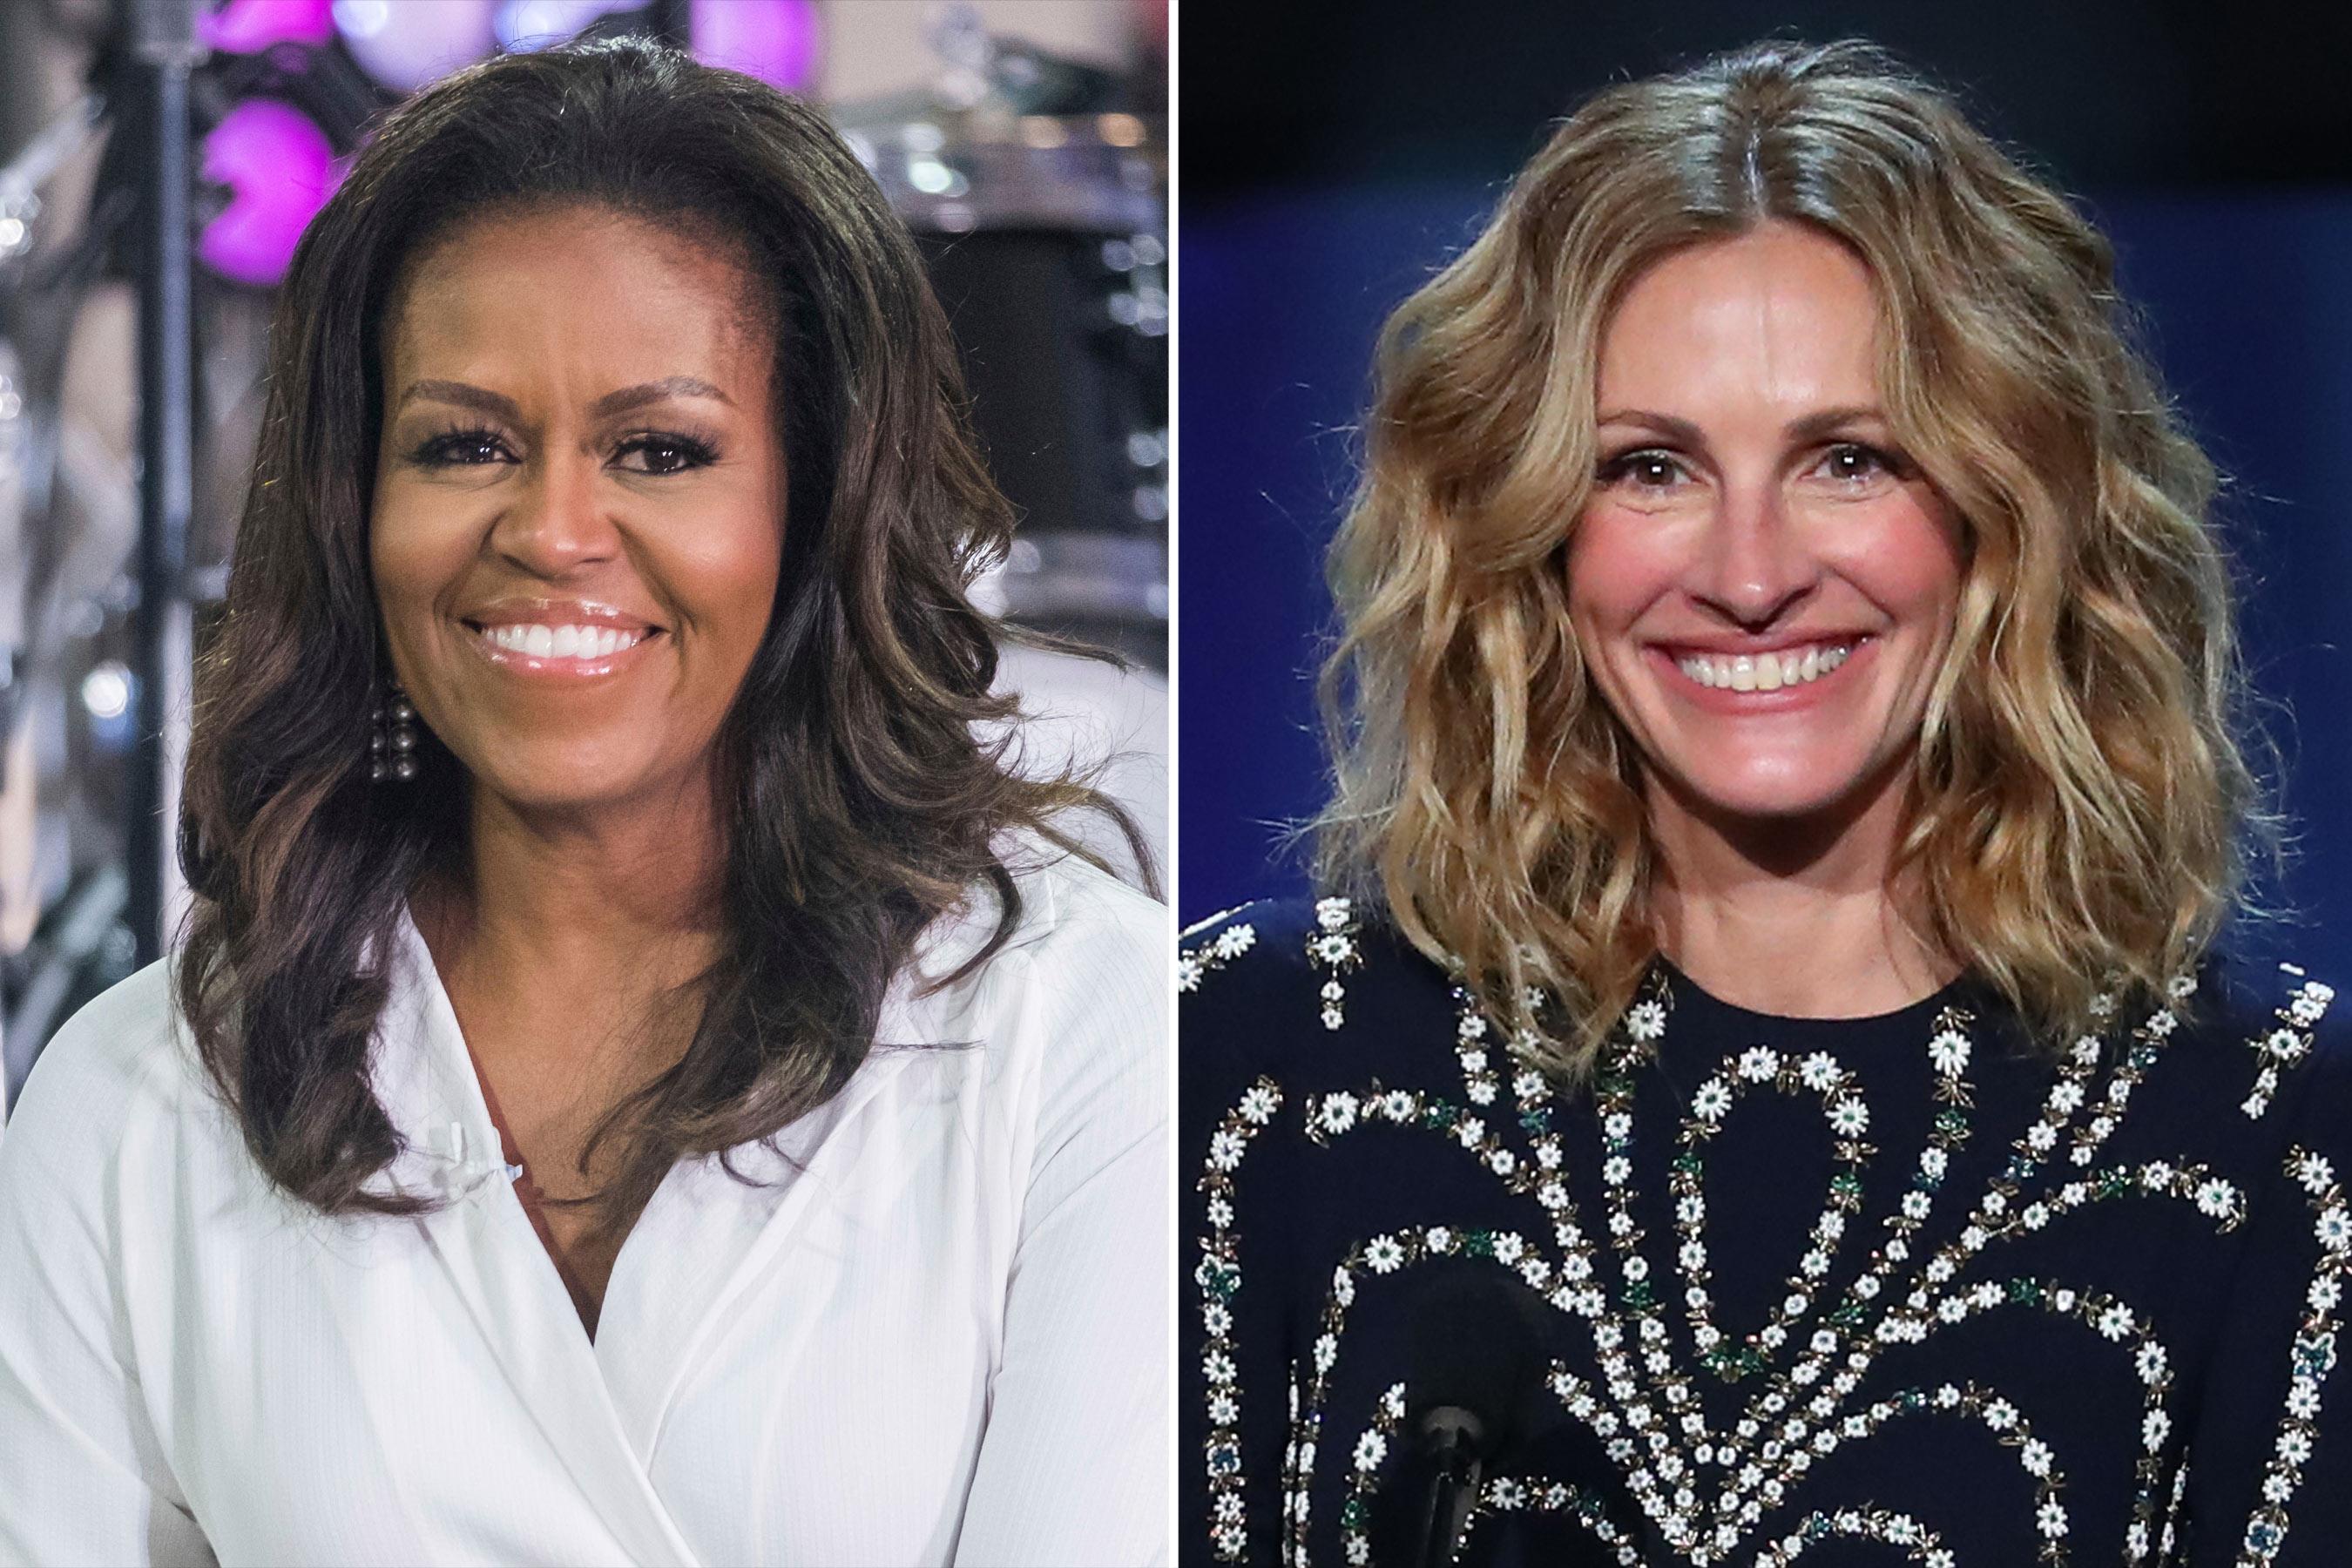 Julia Roberts to join Michelle Obama on Vietnam trip next week